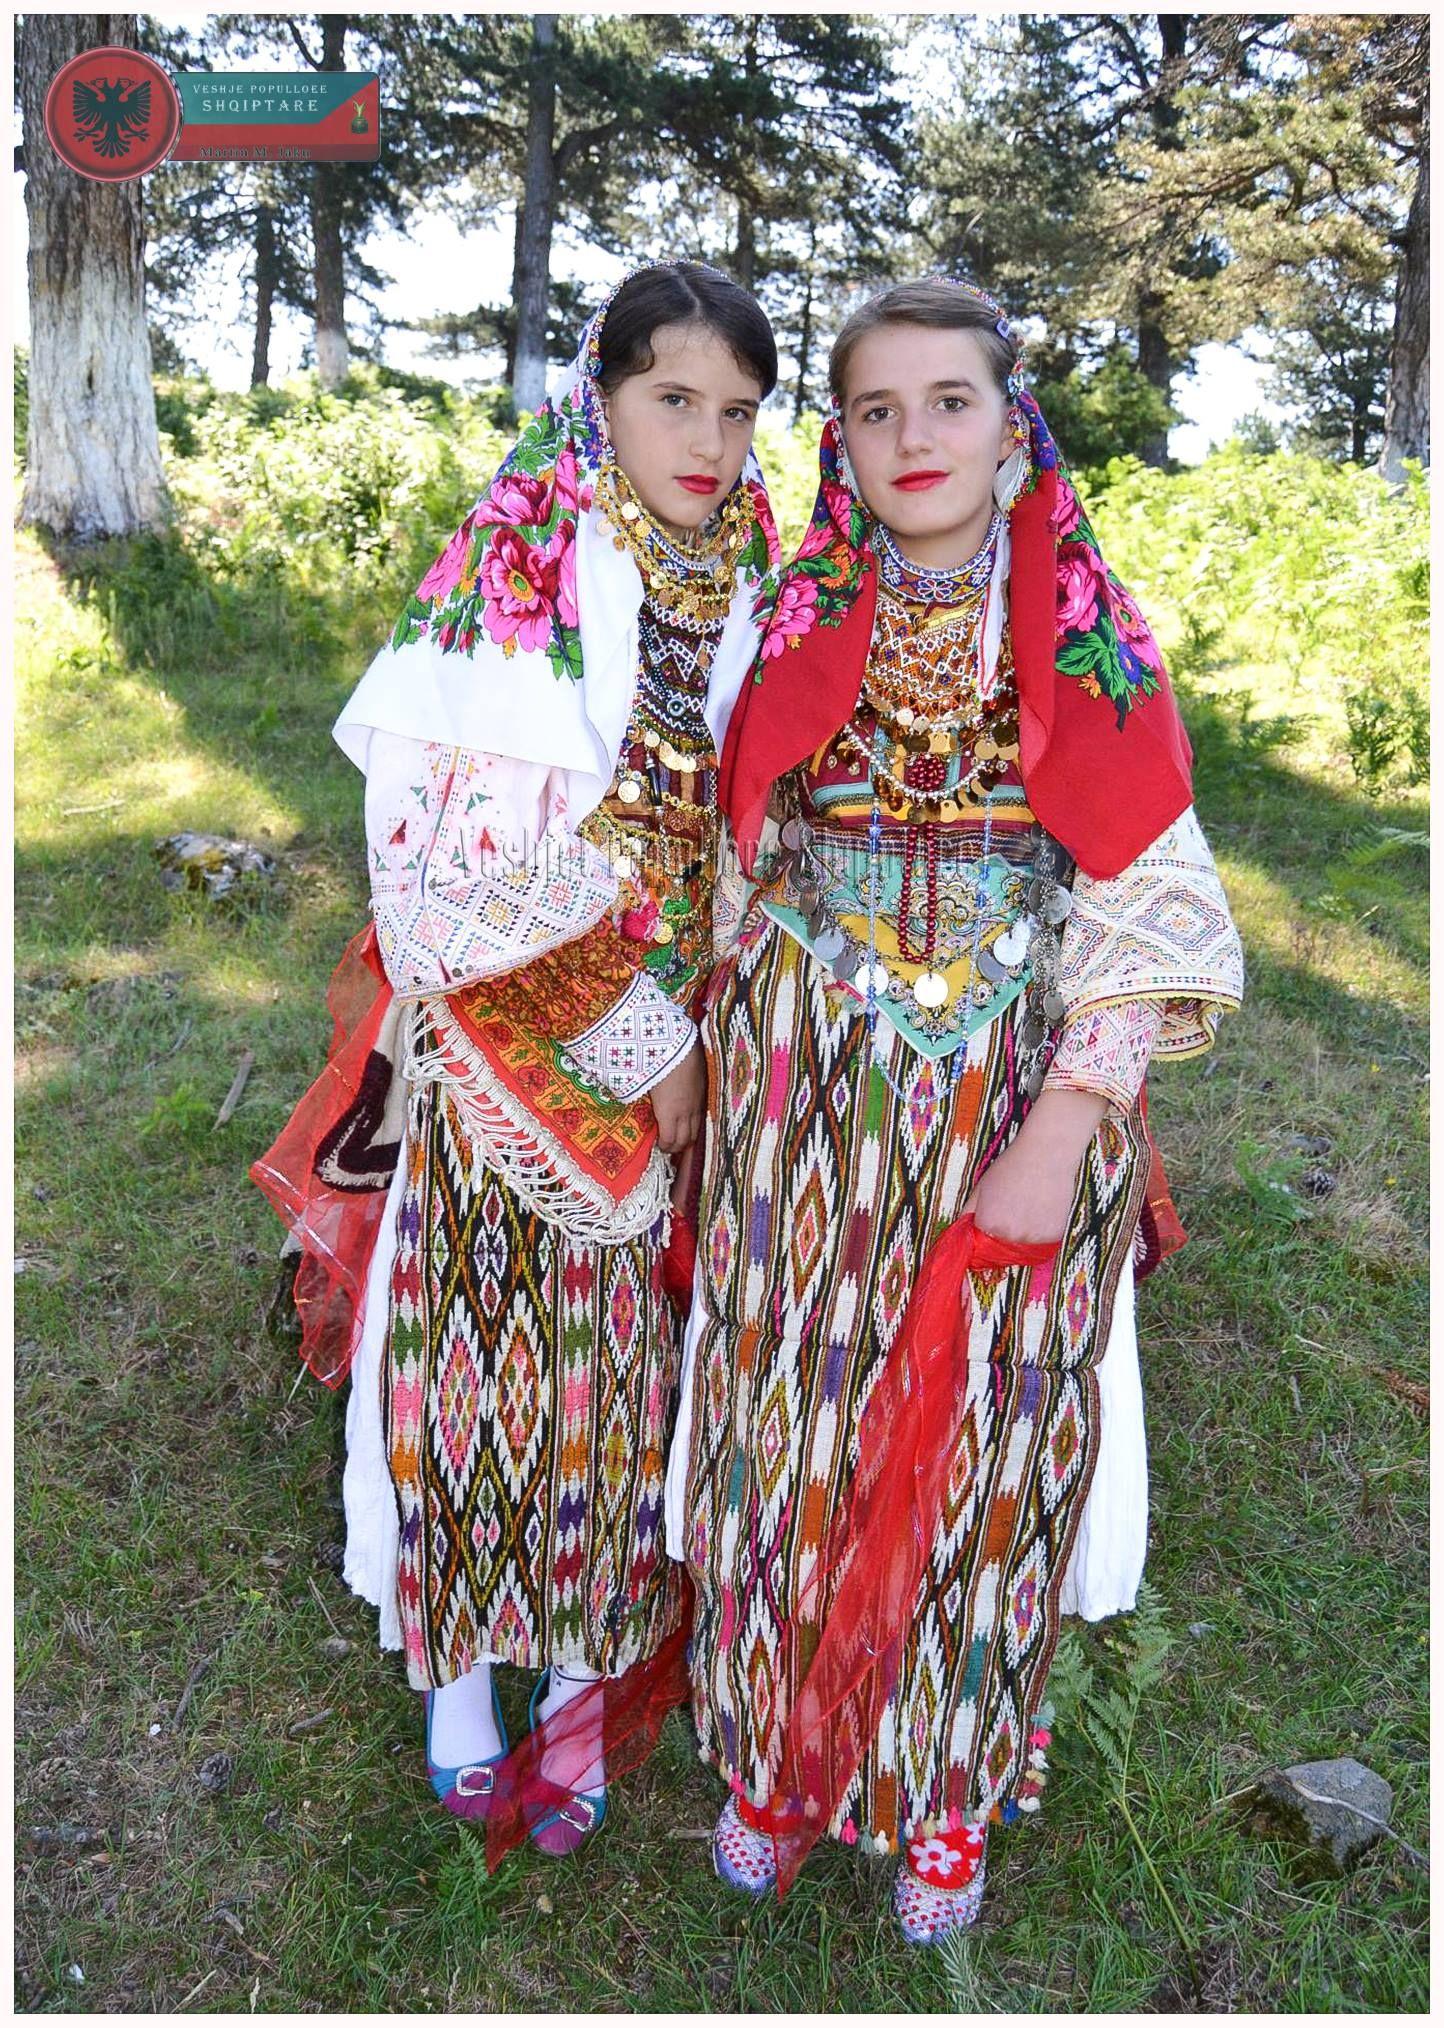 Folk costumes from Elbasan, Albania